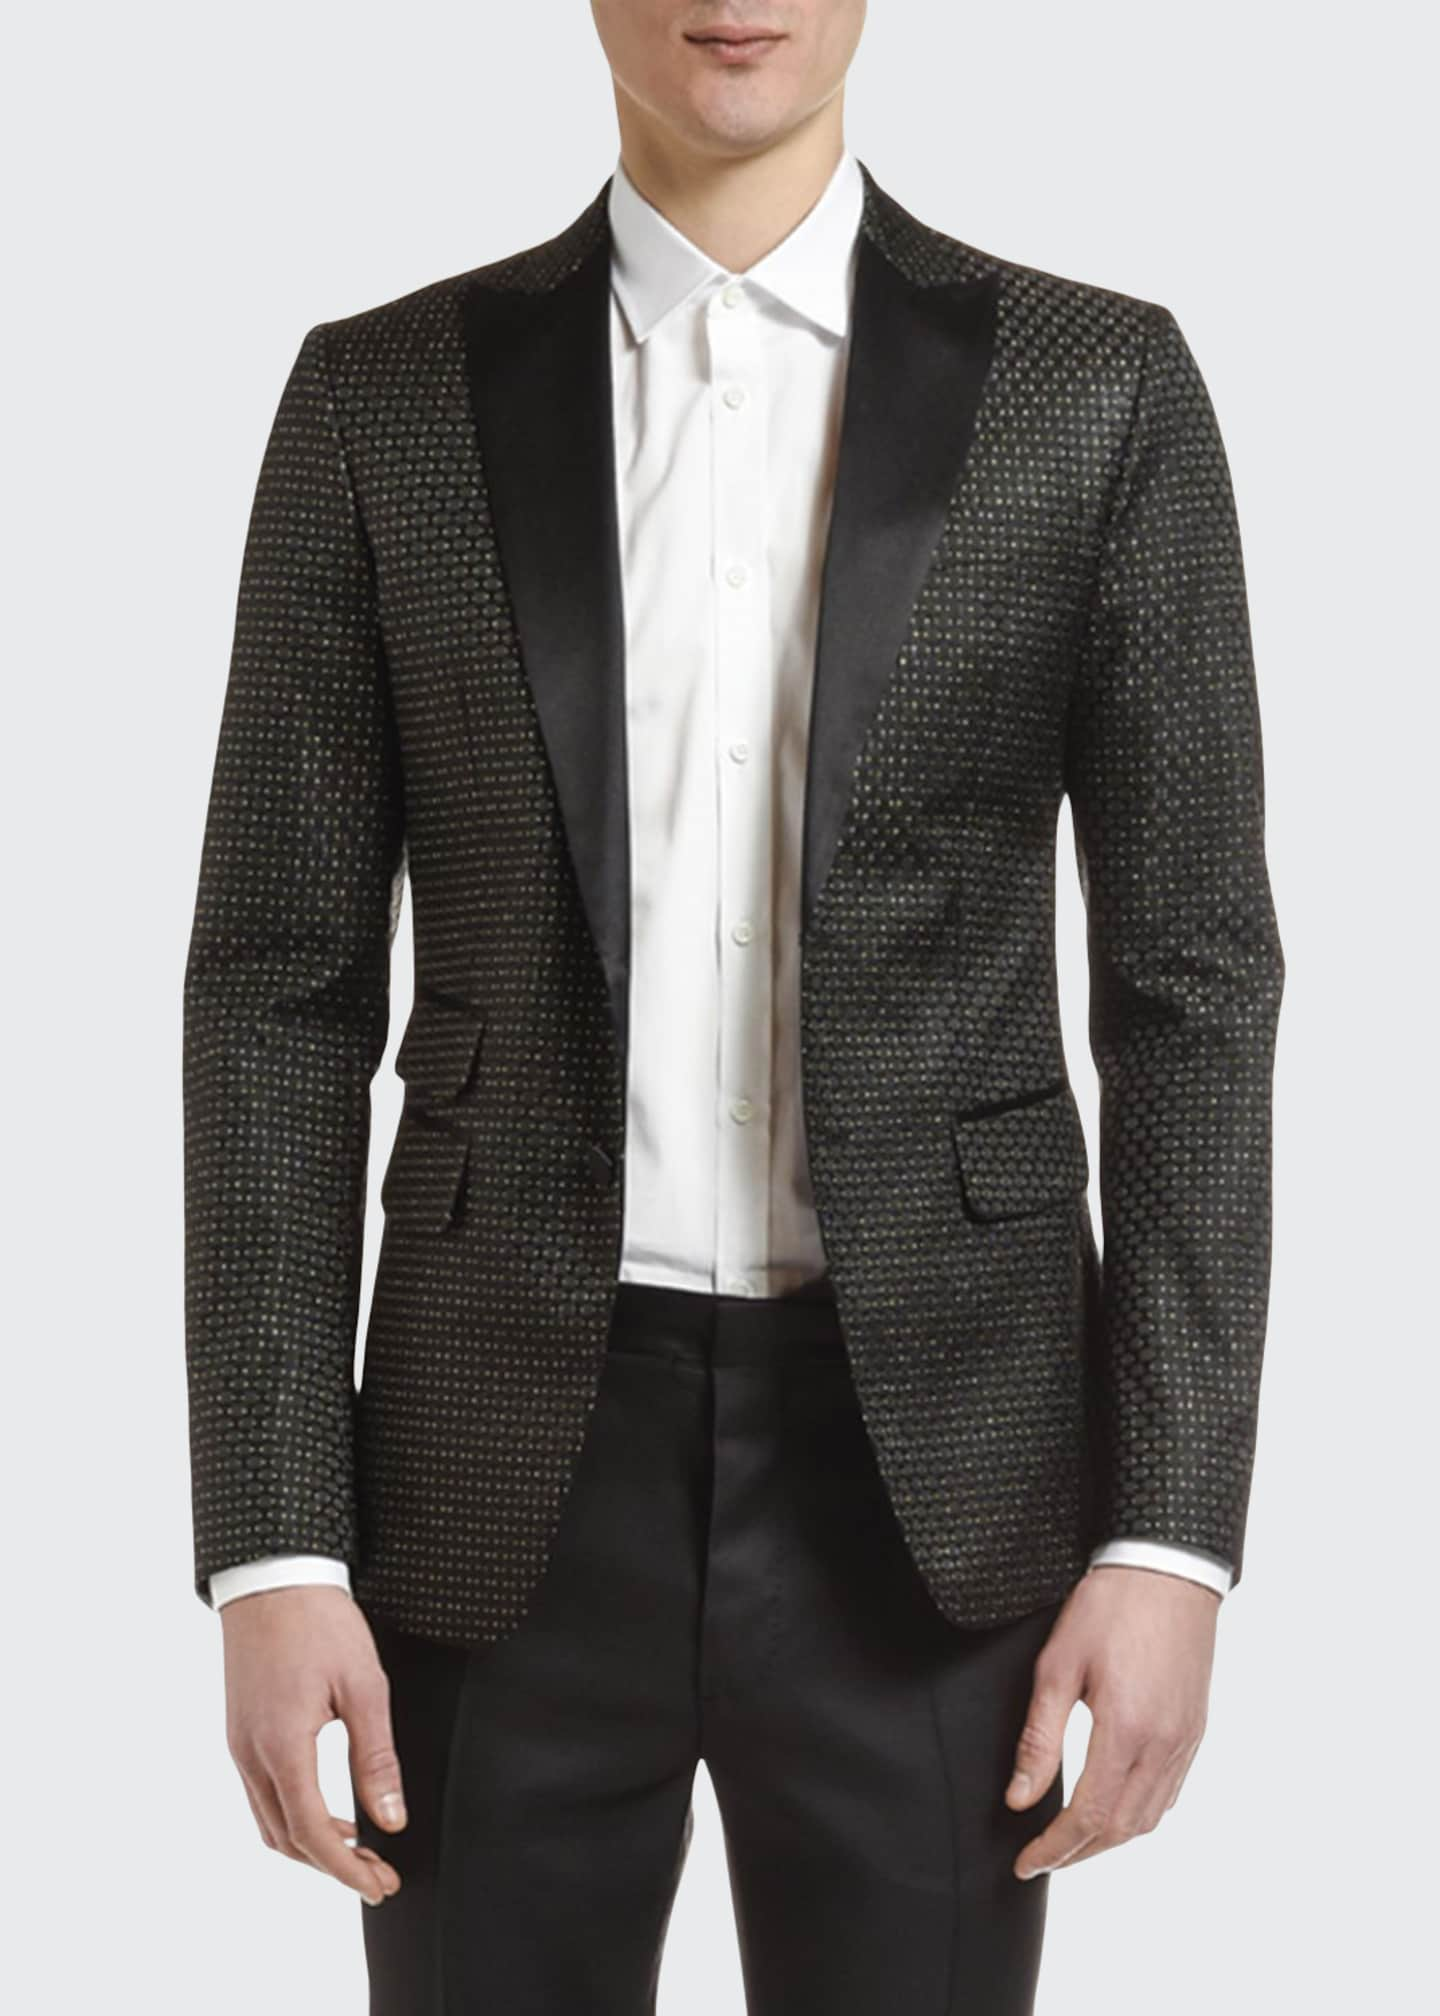 Dsquared2 Men's Textured Silk-Blend Evening Jacket